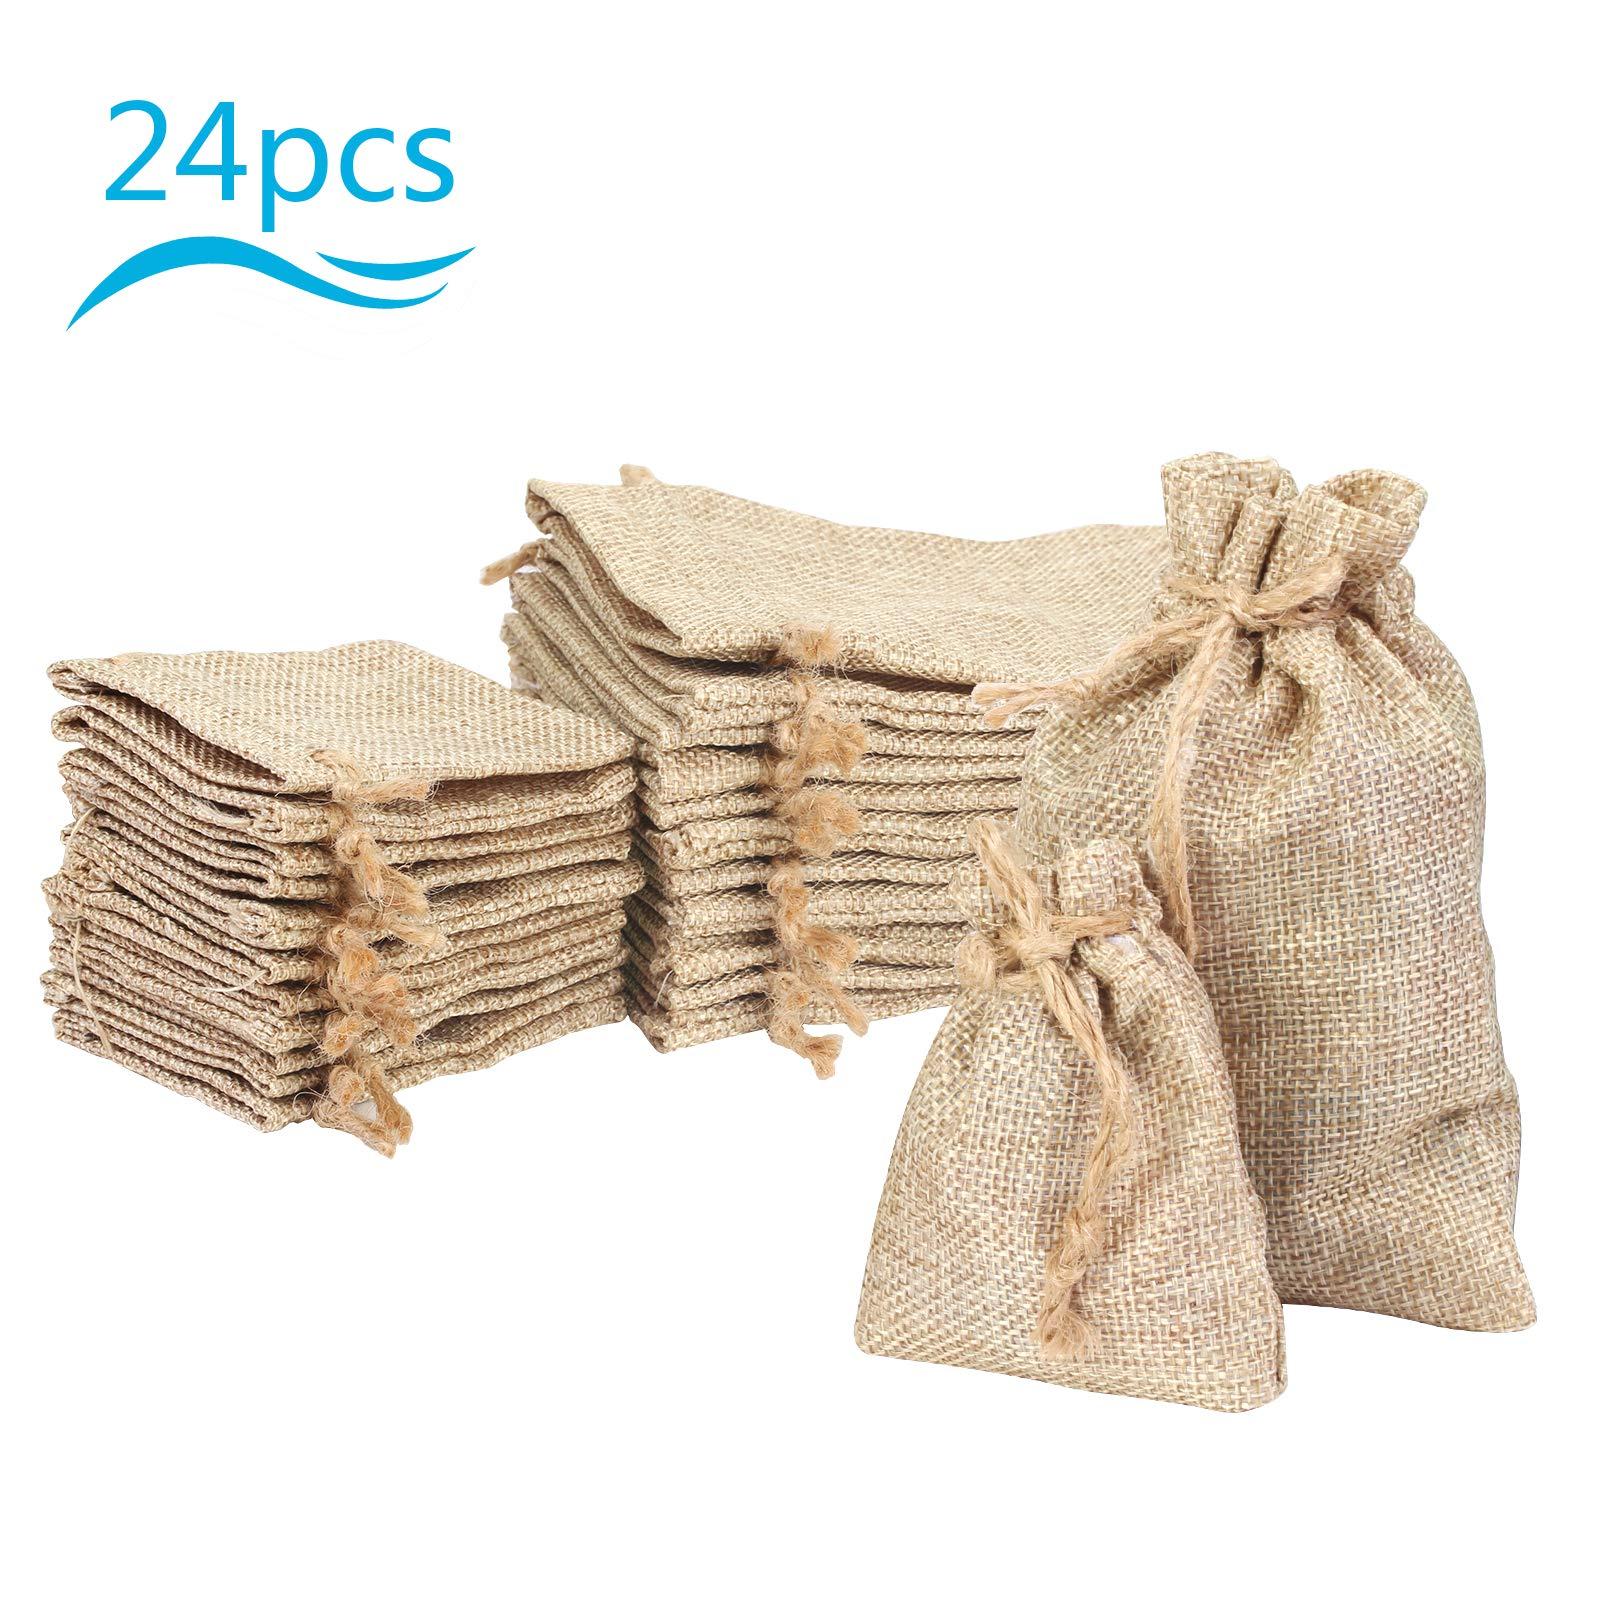 Small burlap bags